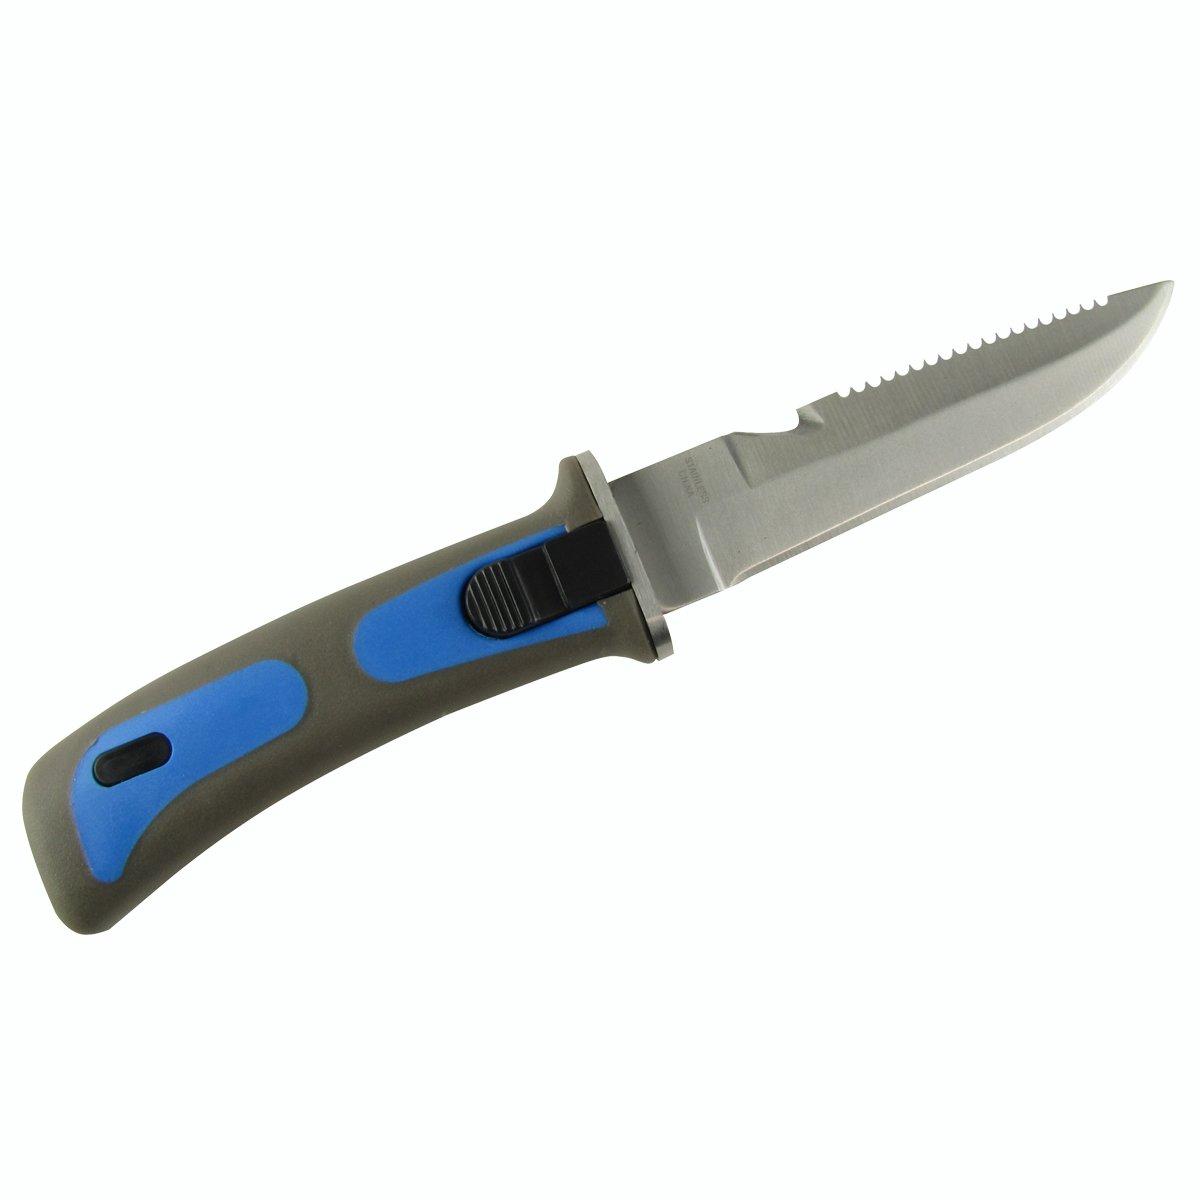 TreasureGurus, LLC Stainless Steel Blue Dive Knife with Sheath Arm or Leg Straps and Line Cutter by TreasureGurus, LLC (Image #5)